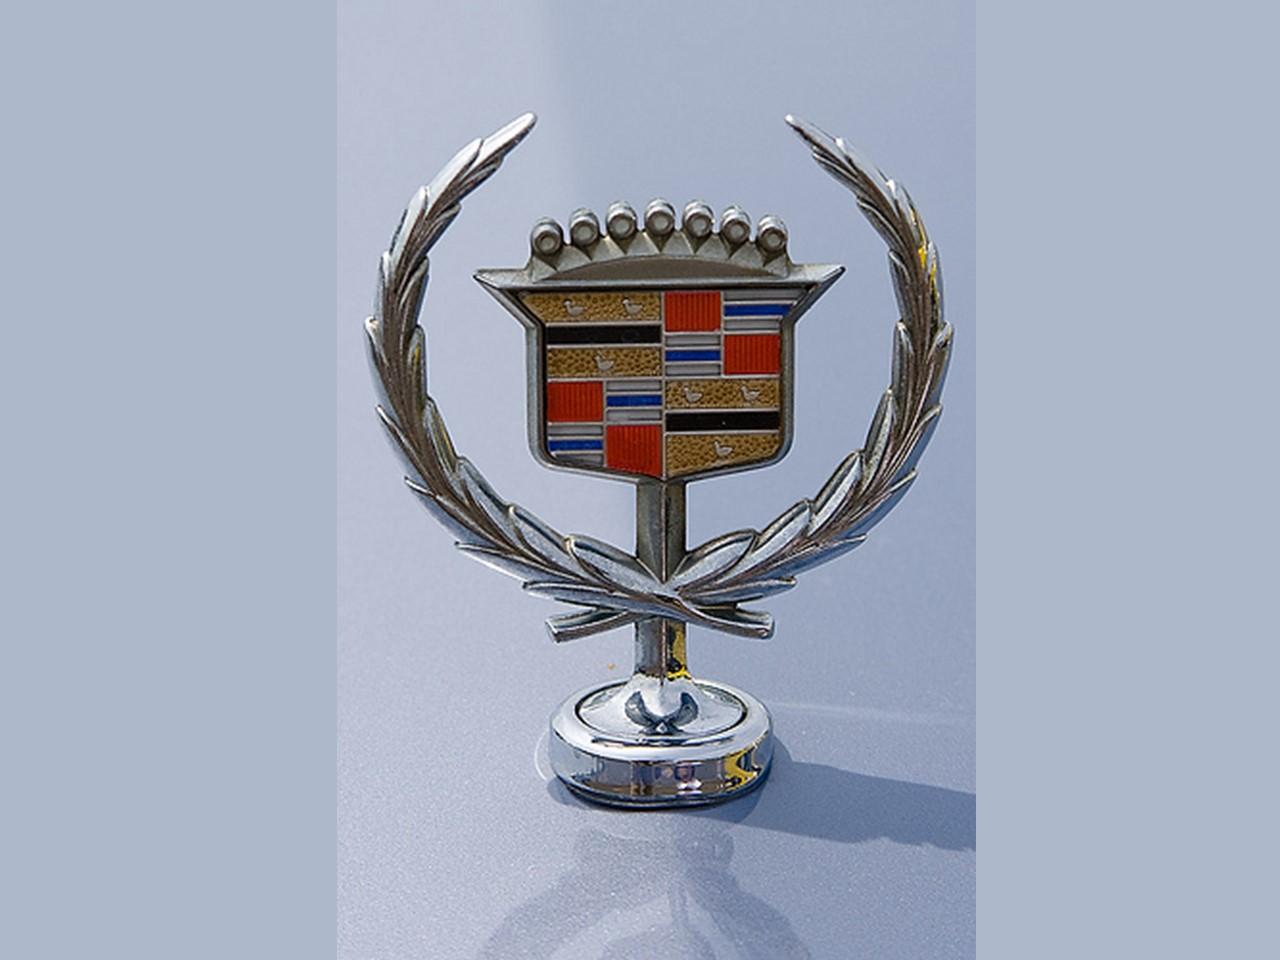 Fleetwood crest